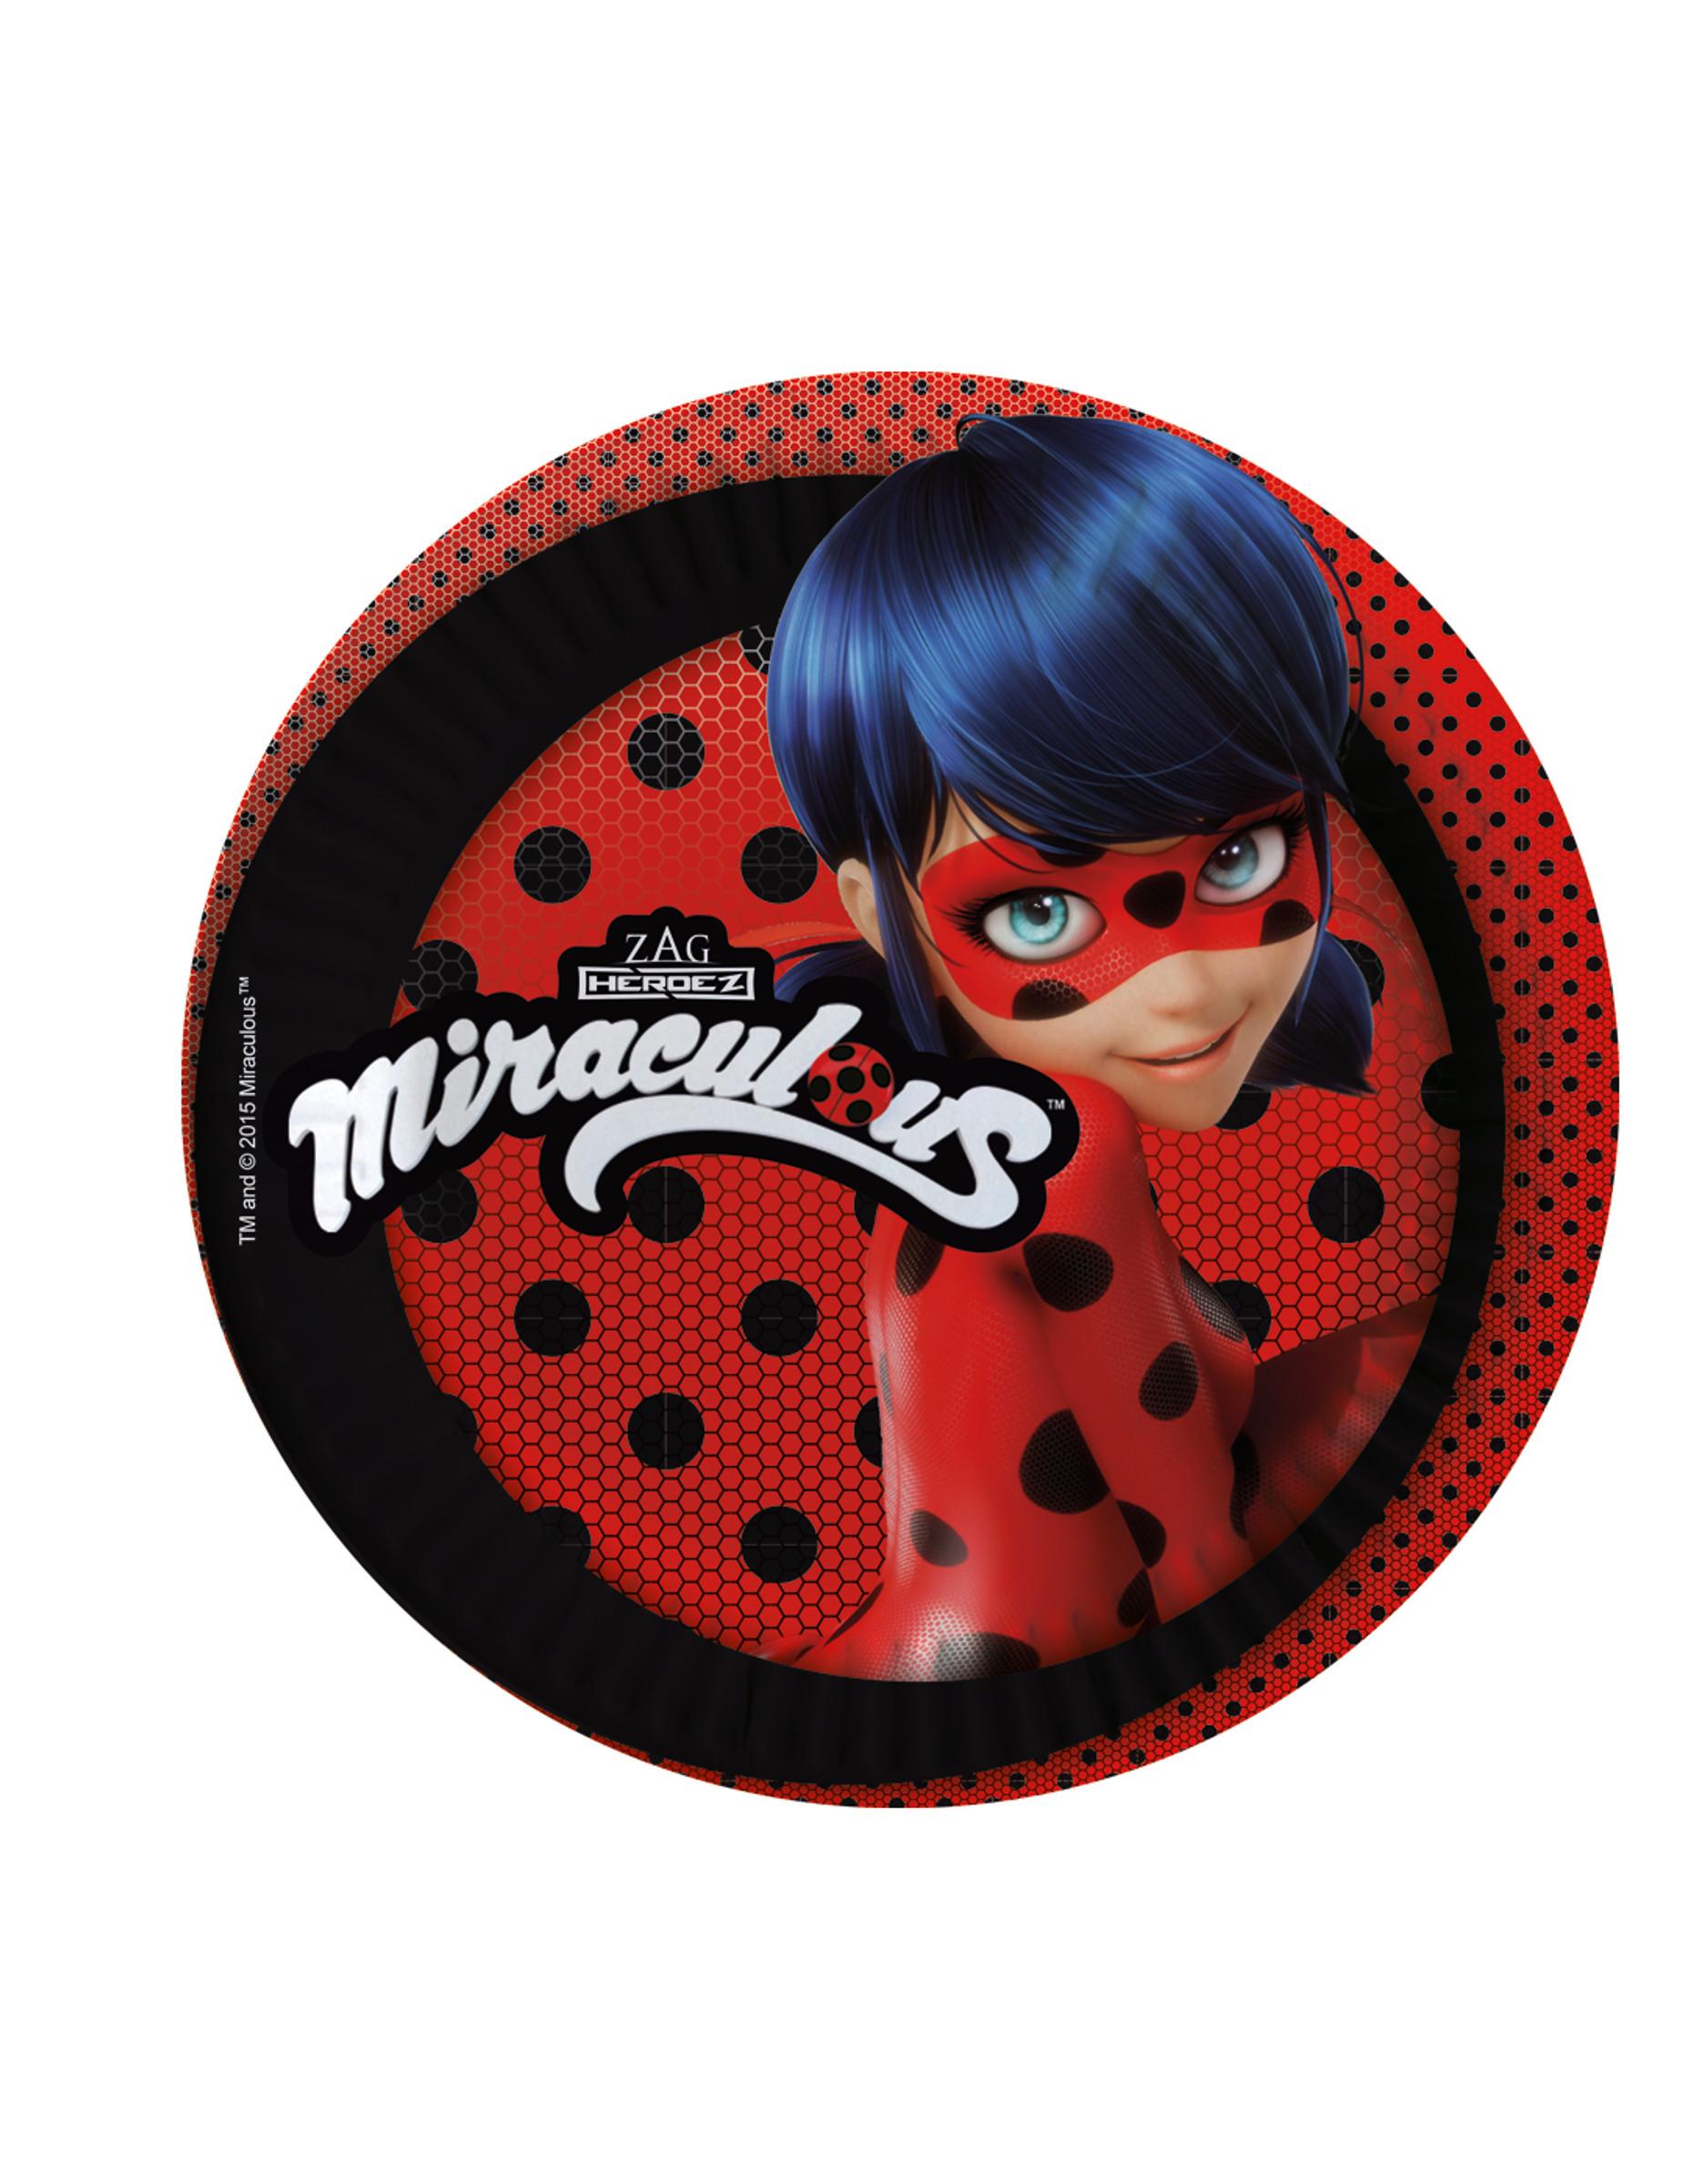 Ladybug Pappteller Tischdekoration Fur Kinder Lizenz 8 Stuck Rot